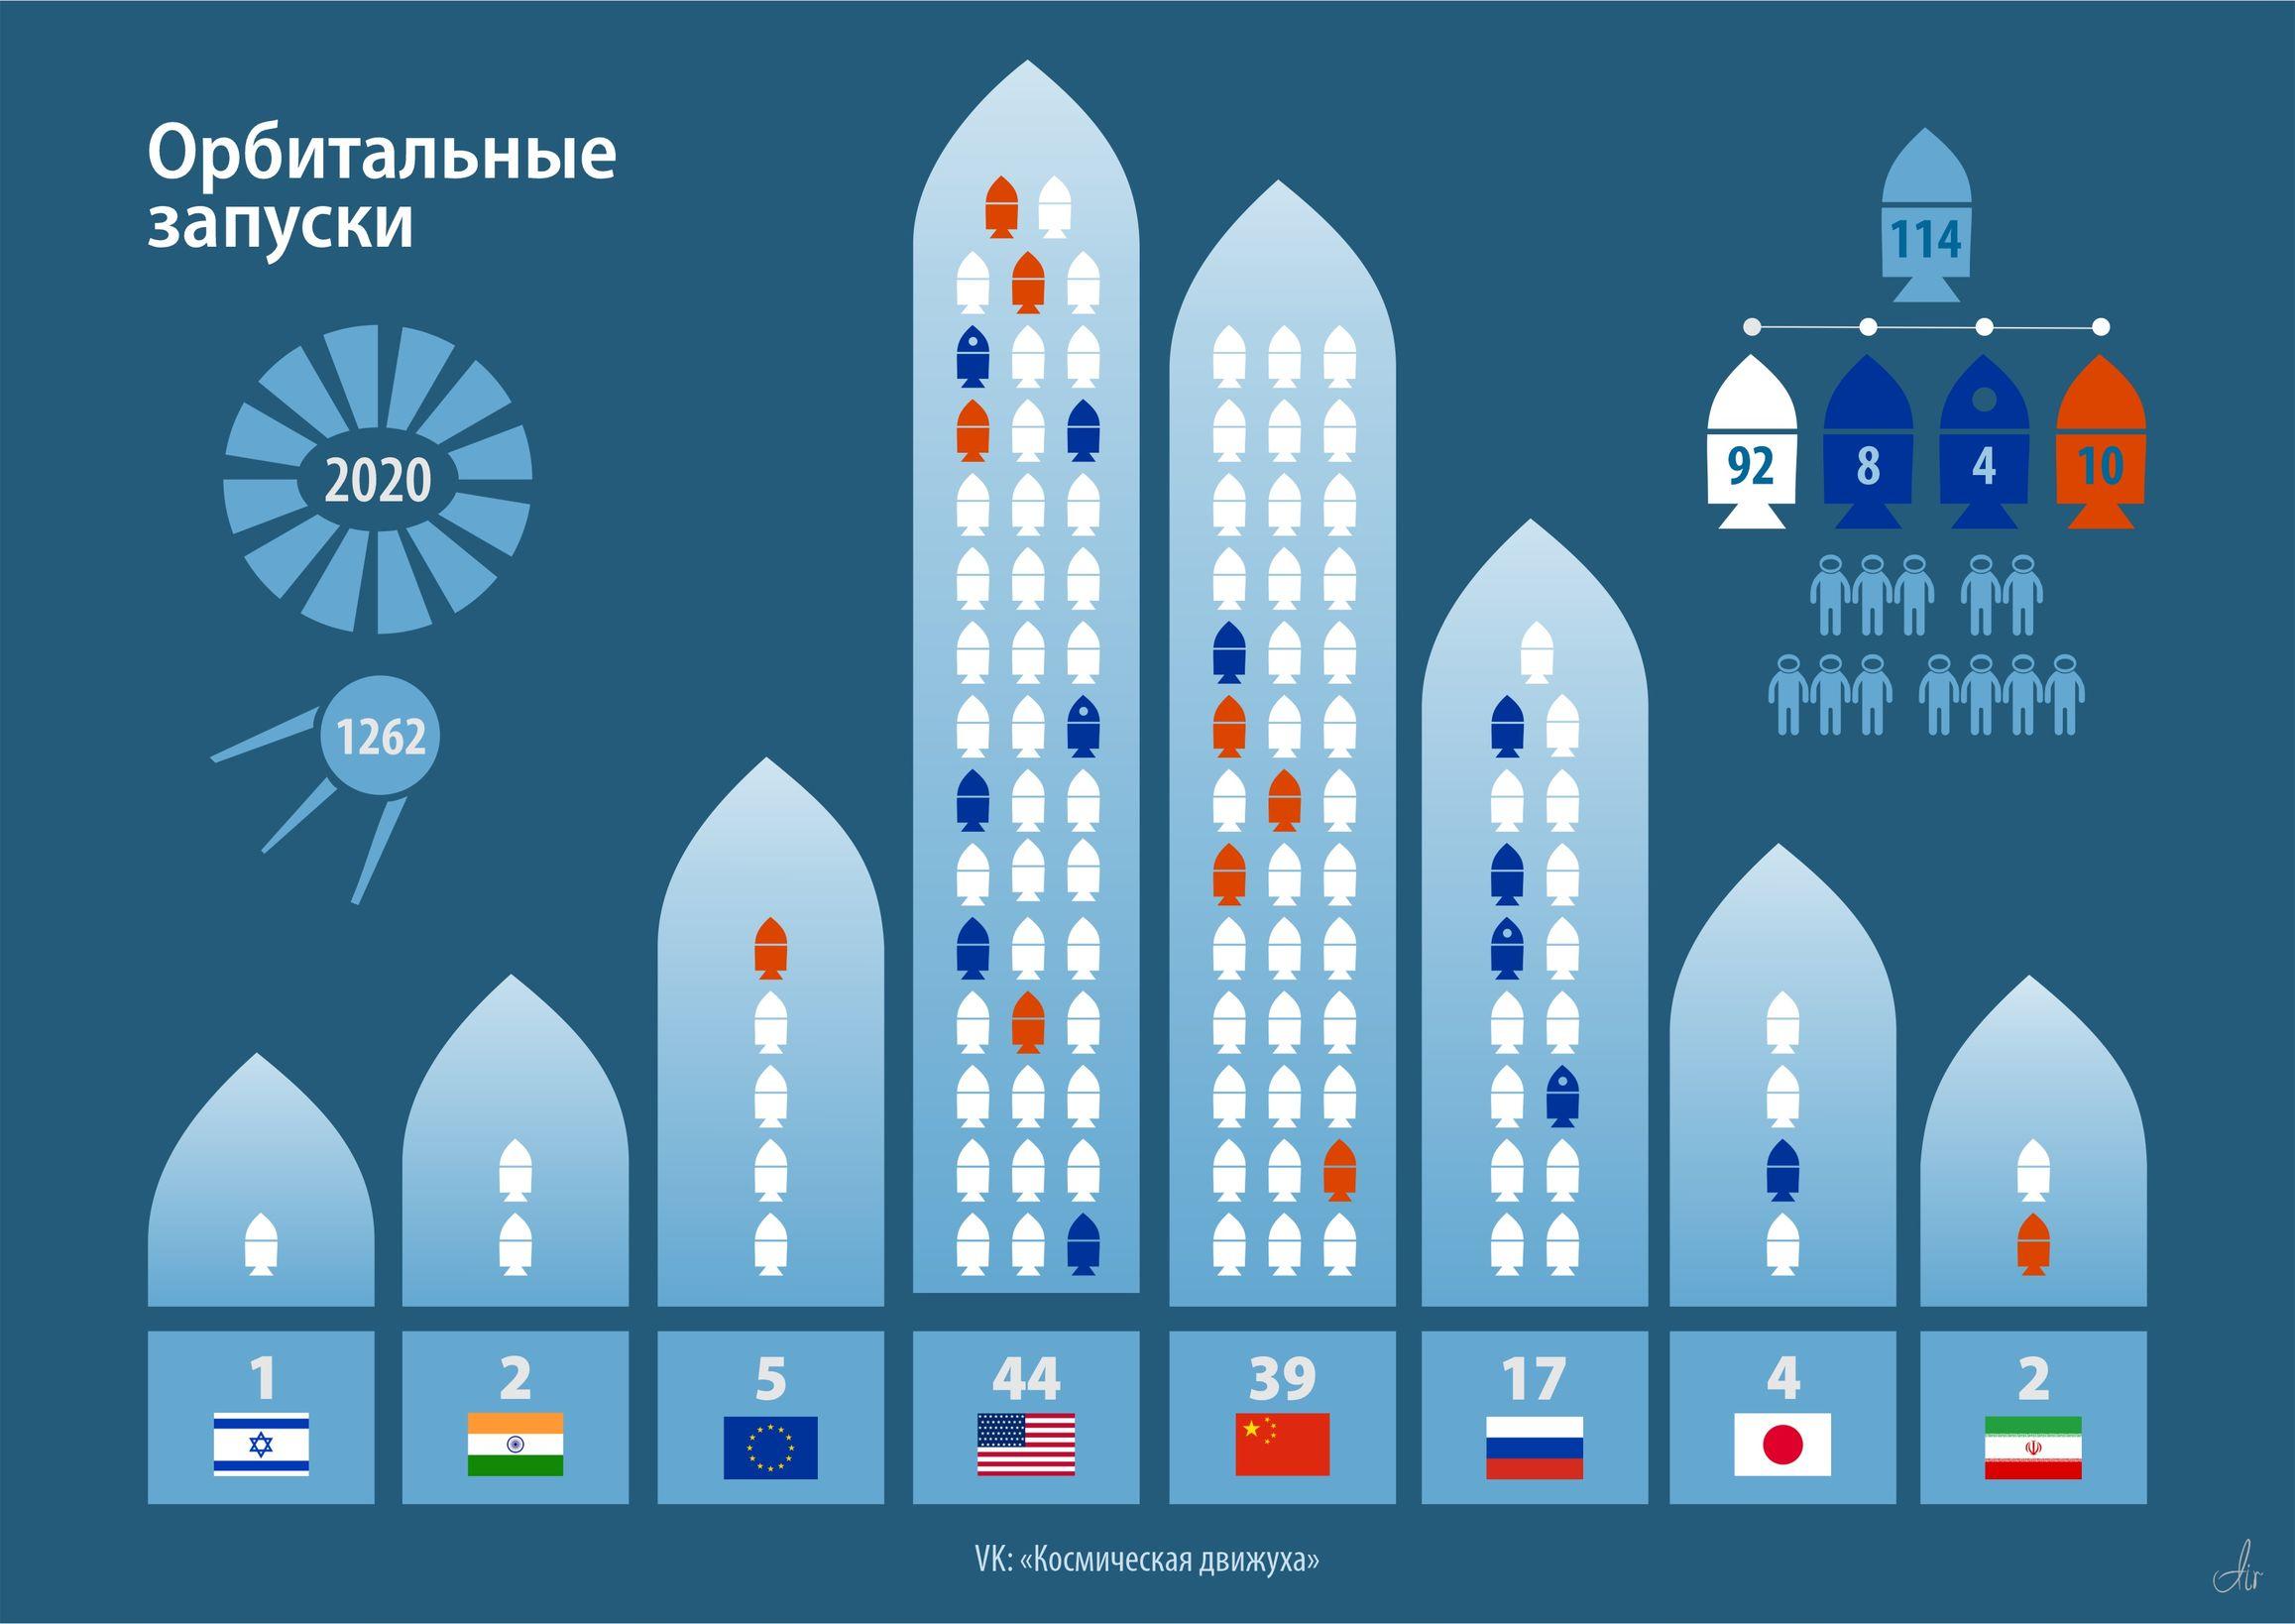 Итоги пусковых программ по странам за 2020 год.